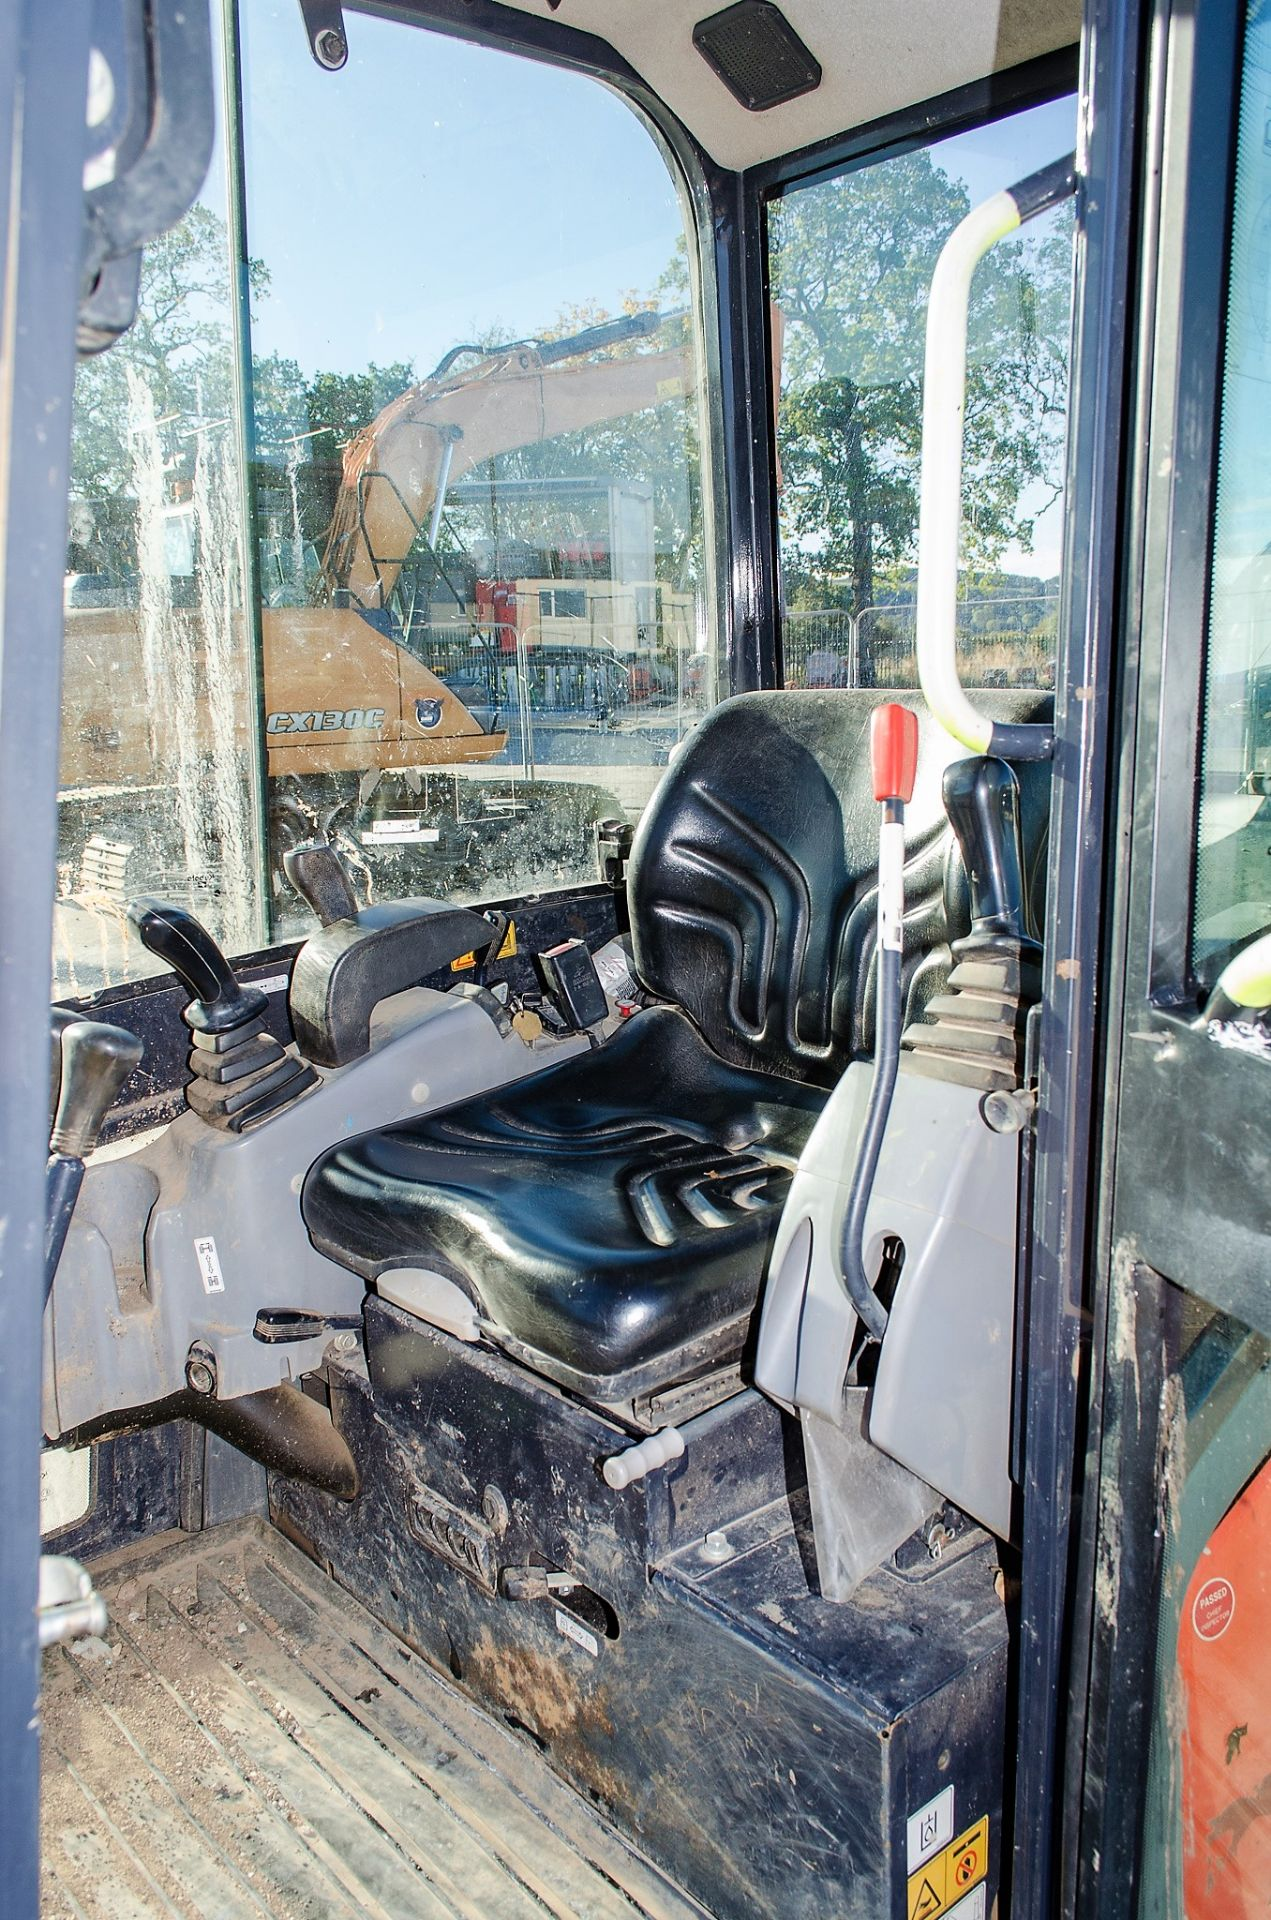 Kubota KX016-4 1.5 tonne rubber tracked mini excavator Year: 2015 S/N: 58688 Recorded Hours: 1736 - Image 15 of 19